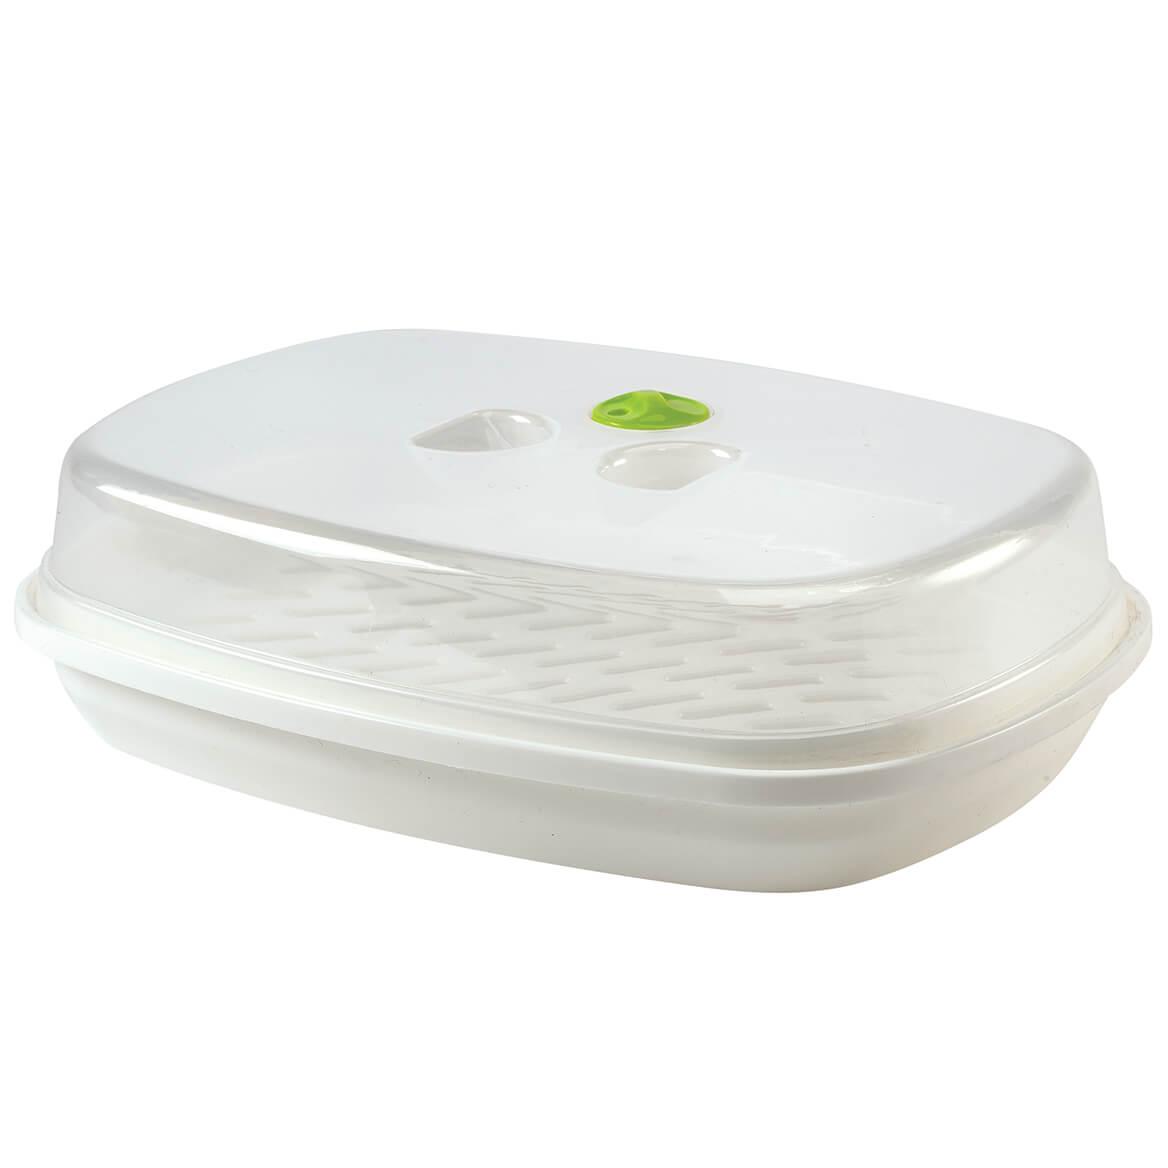 3 PC All Purpose Microwave Steamer-370740